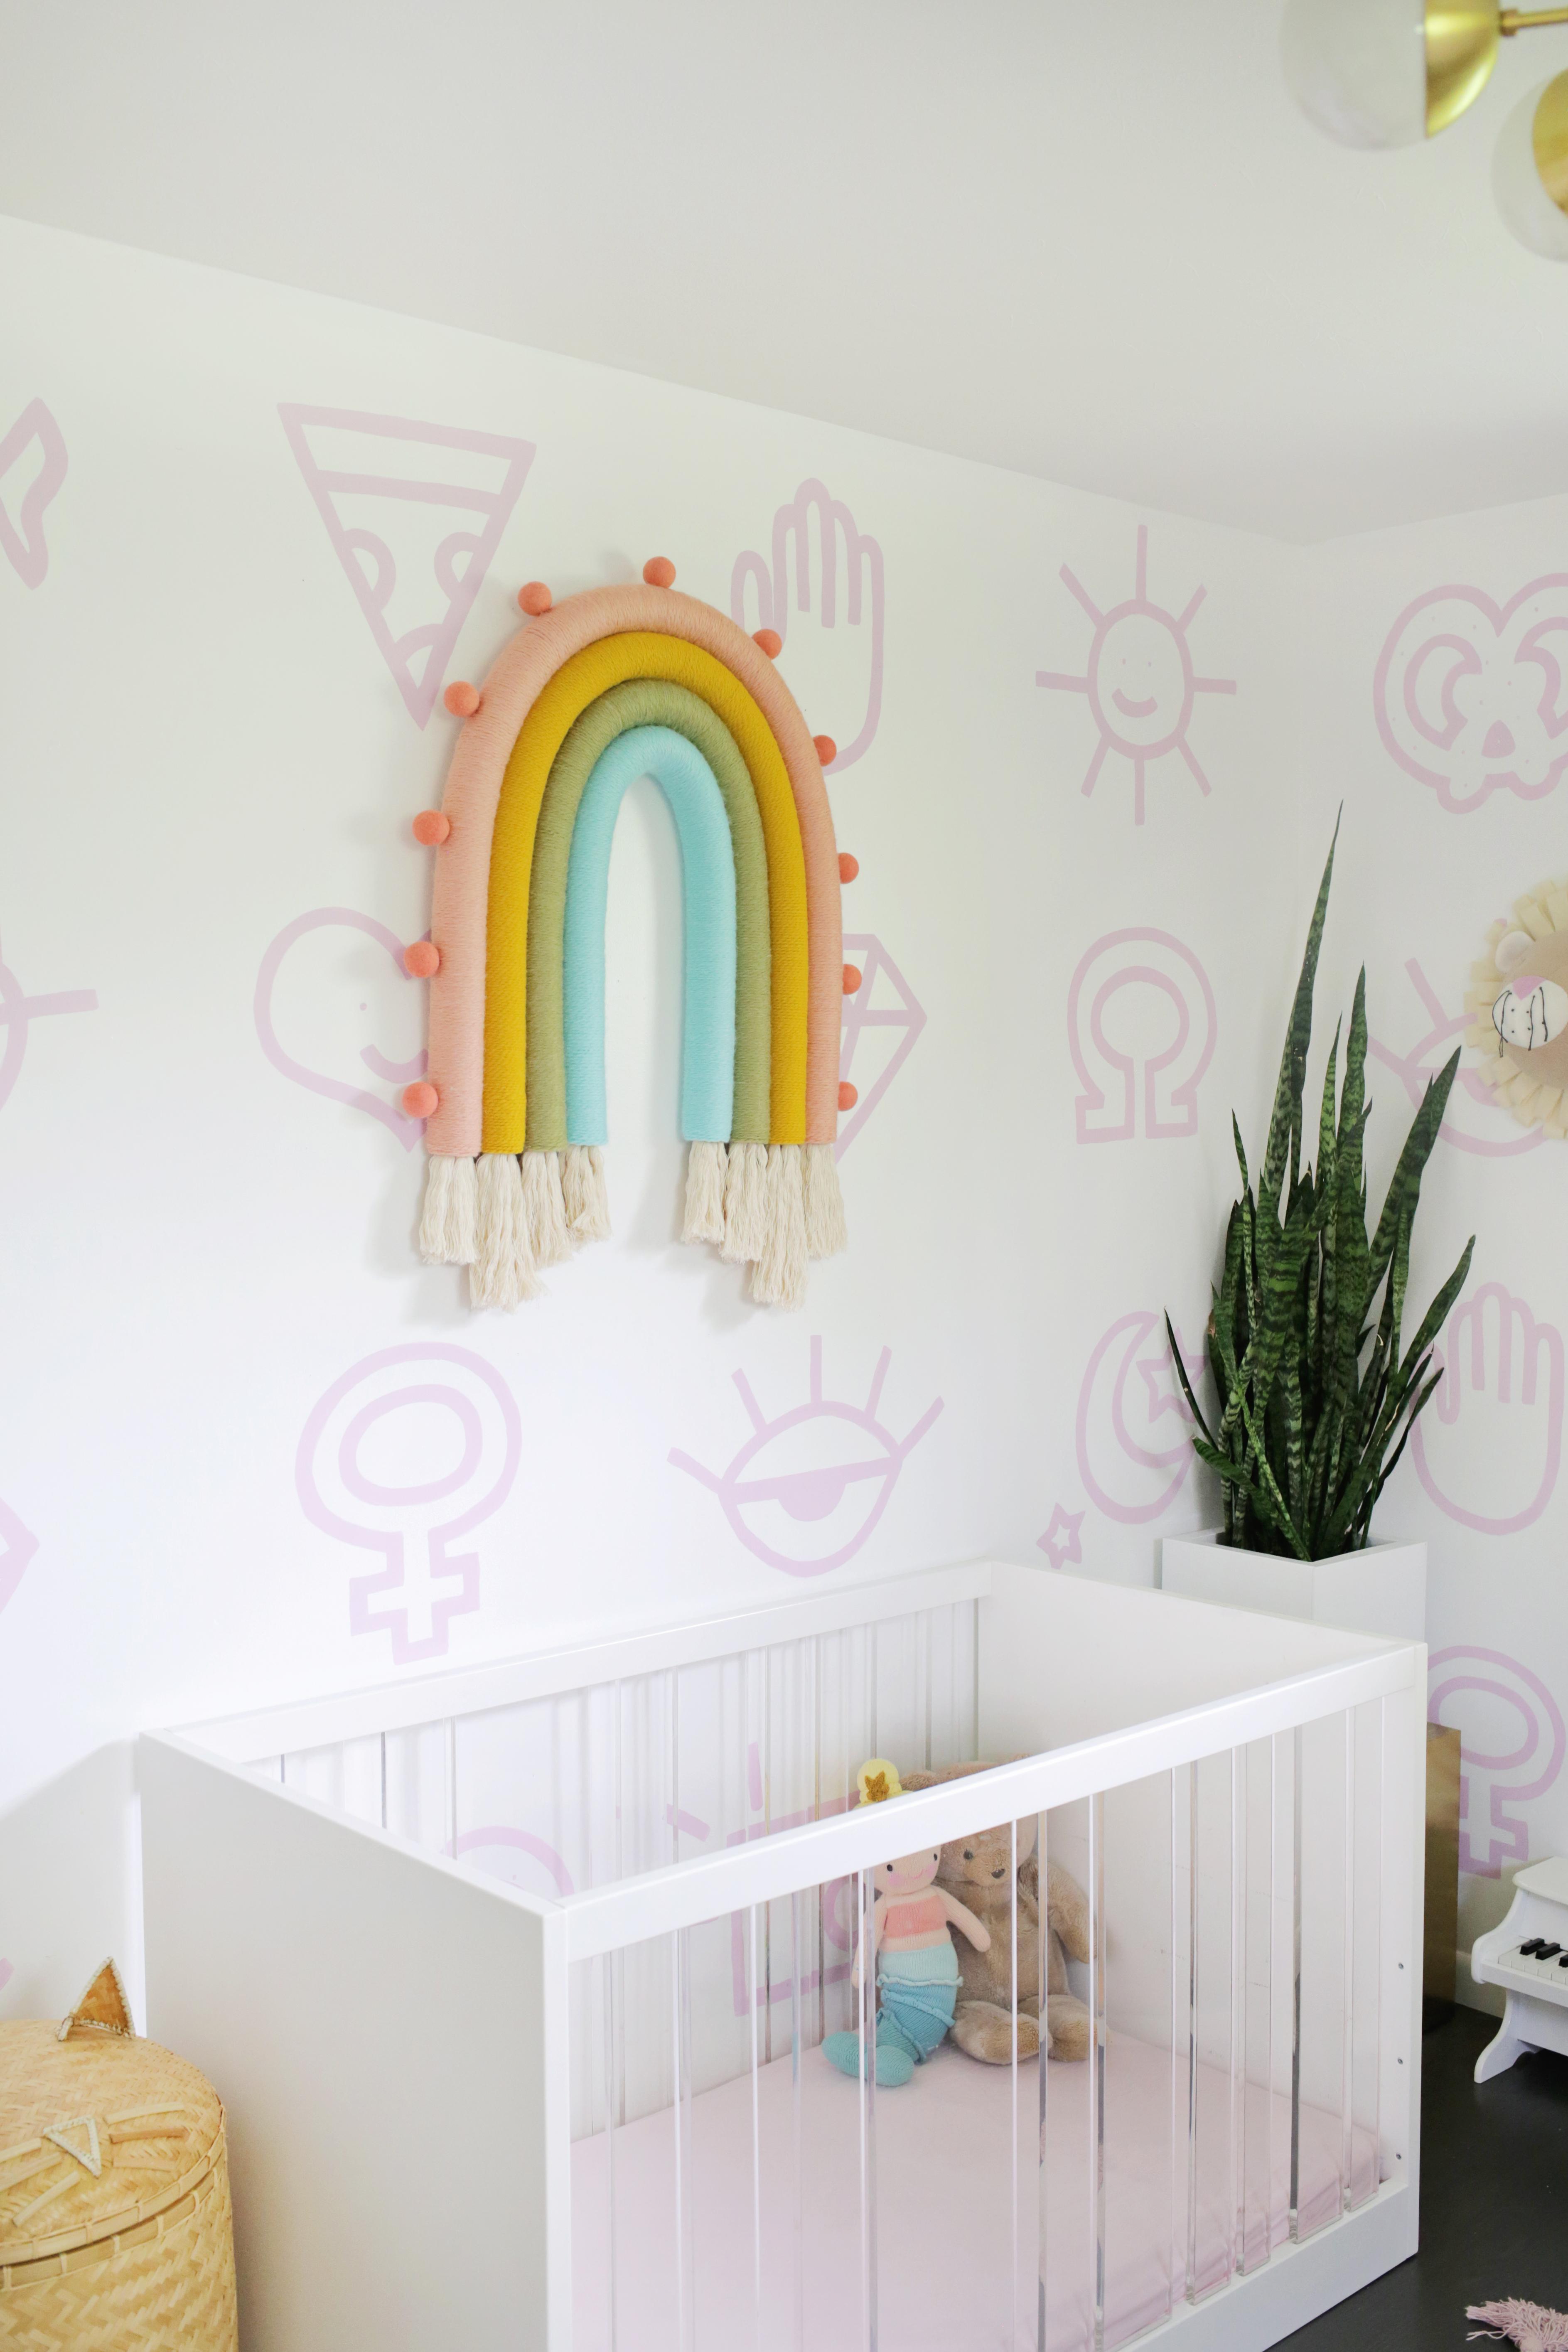 Oversized Rainbow Wall Hanging DIY!